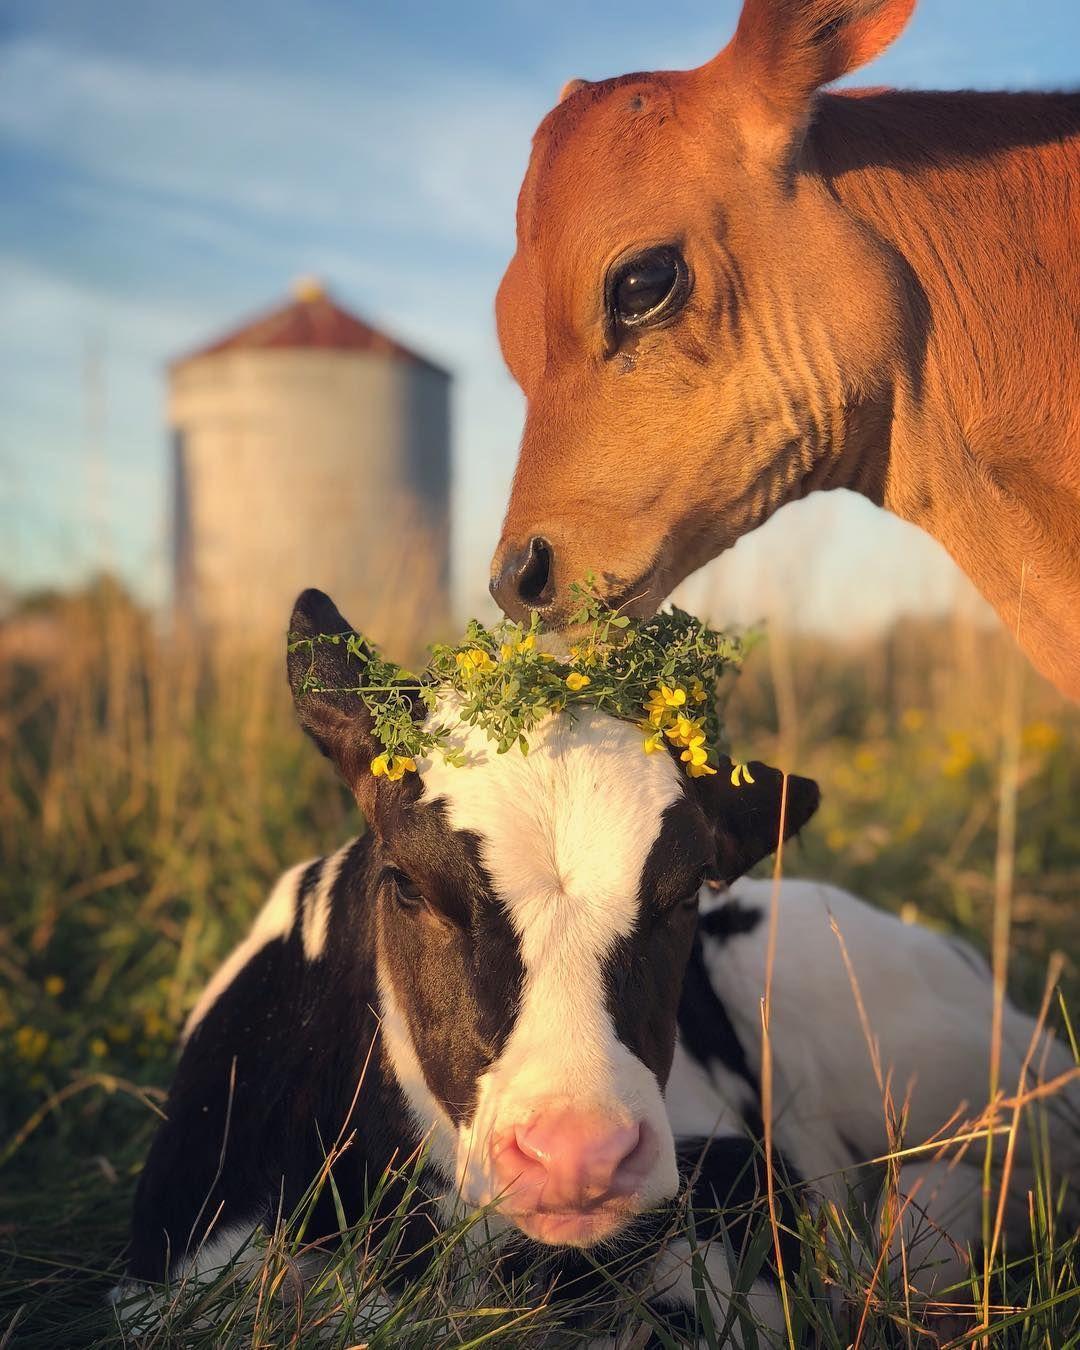 Little Calf Calvin Enjoying Some Tasty Flower Crownhttps I Redd It A5epk9hse0g11 Jpg Baby Farm Animals Cute Animals Cute Baby Cow